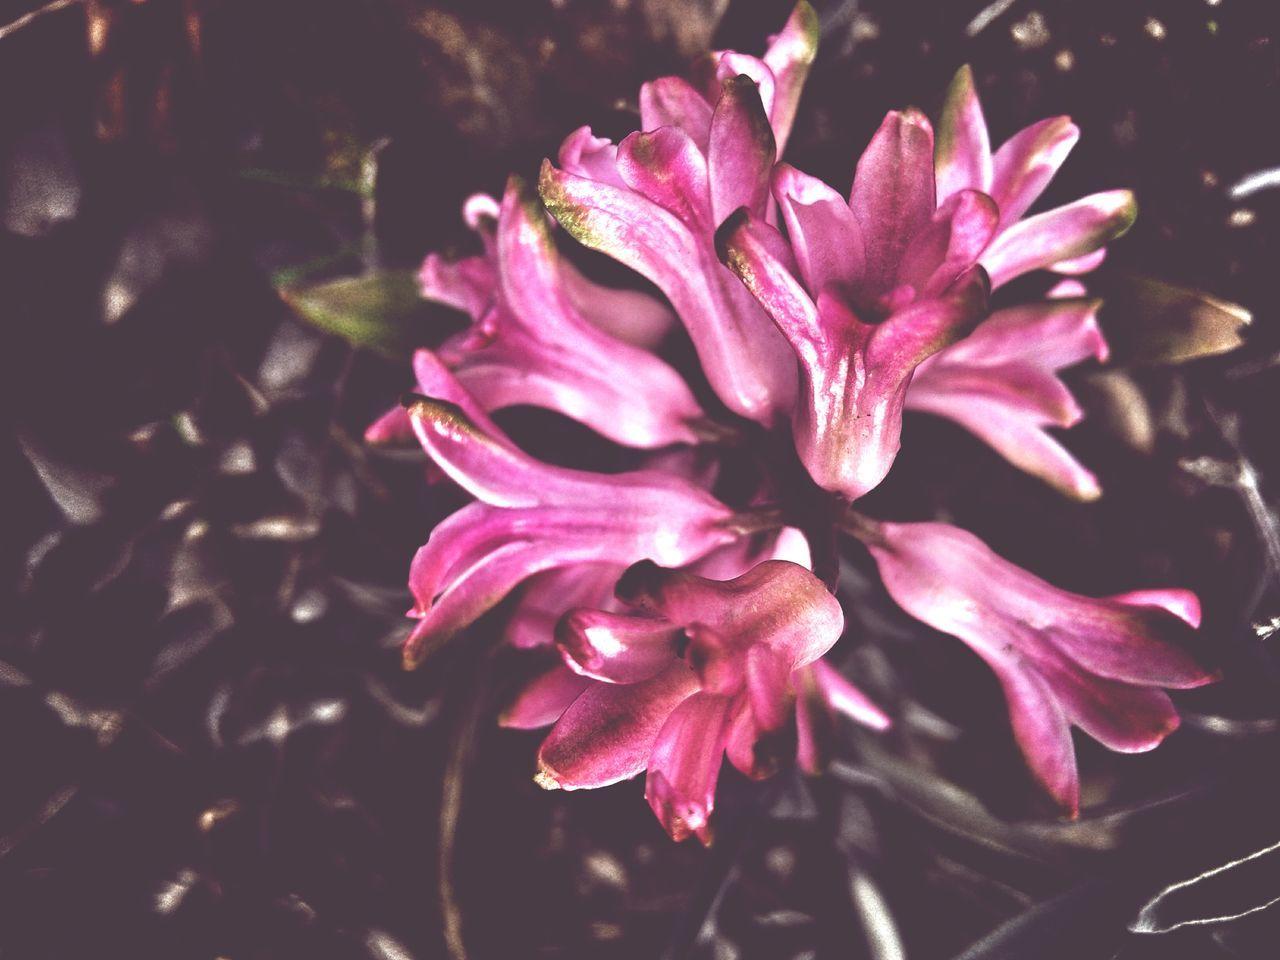 Hyacinth Hyacinth Flower Pink Macro Spring Spring Flowers Blossom Garden Treasures